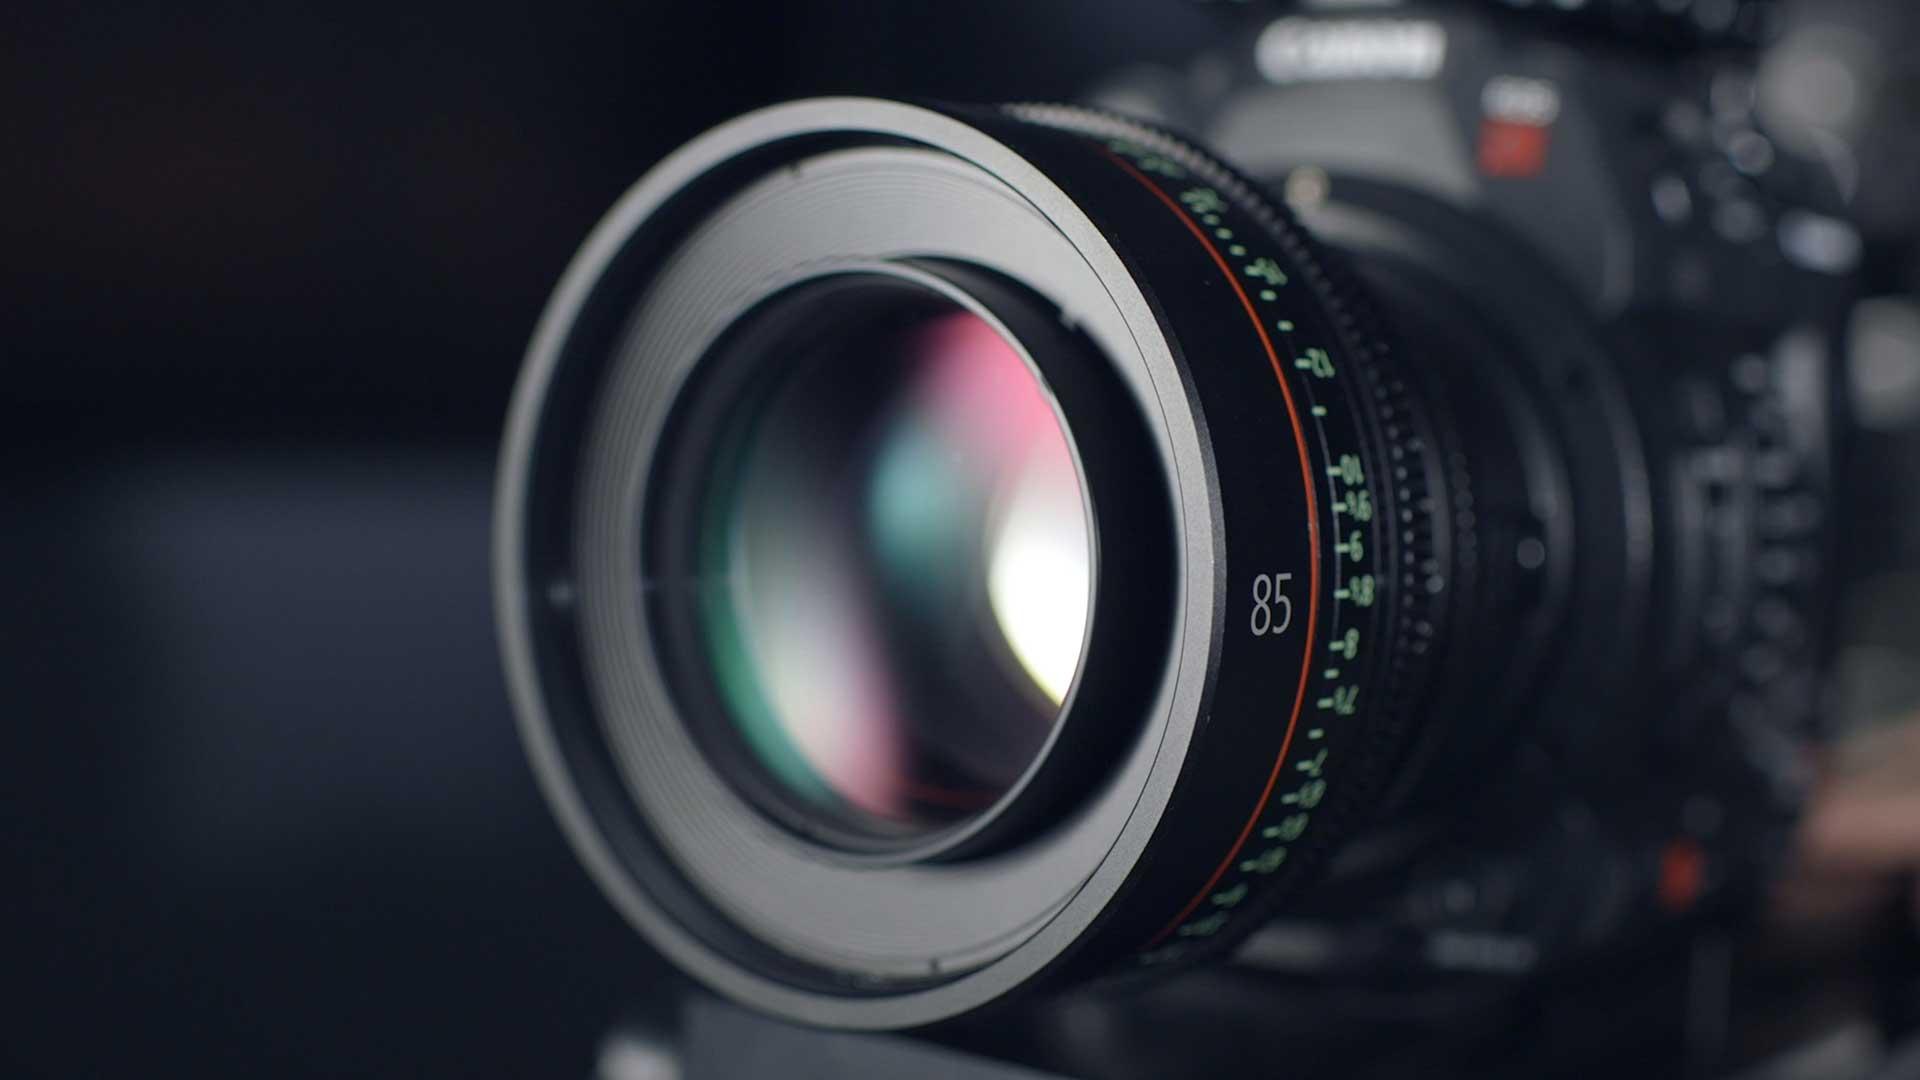 close up of a dslr camera lens on a black canon camera